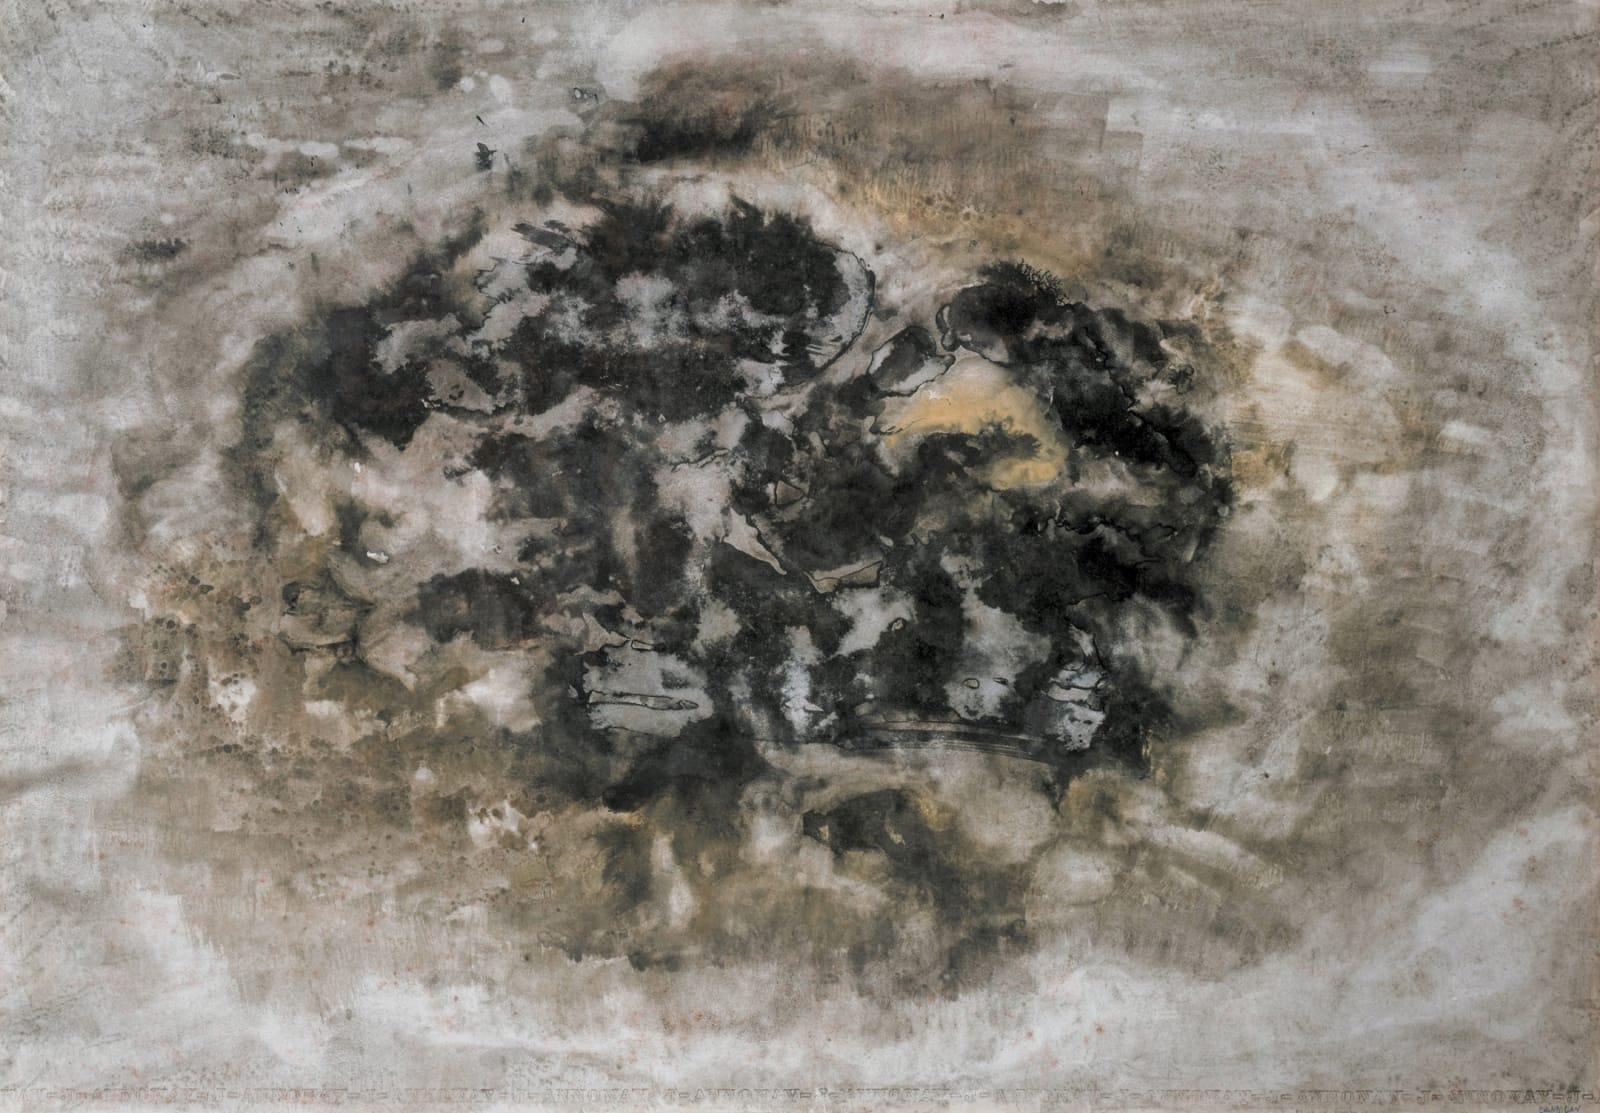 Lalan 謝景蘭, Shining Heart《閃亮的心》, 1958-1959